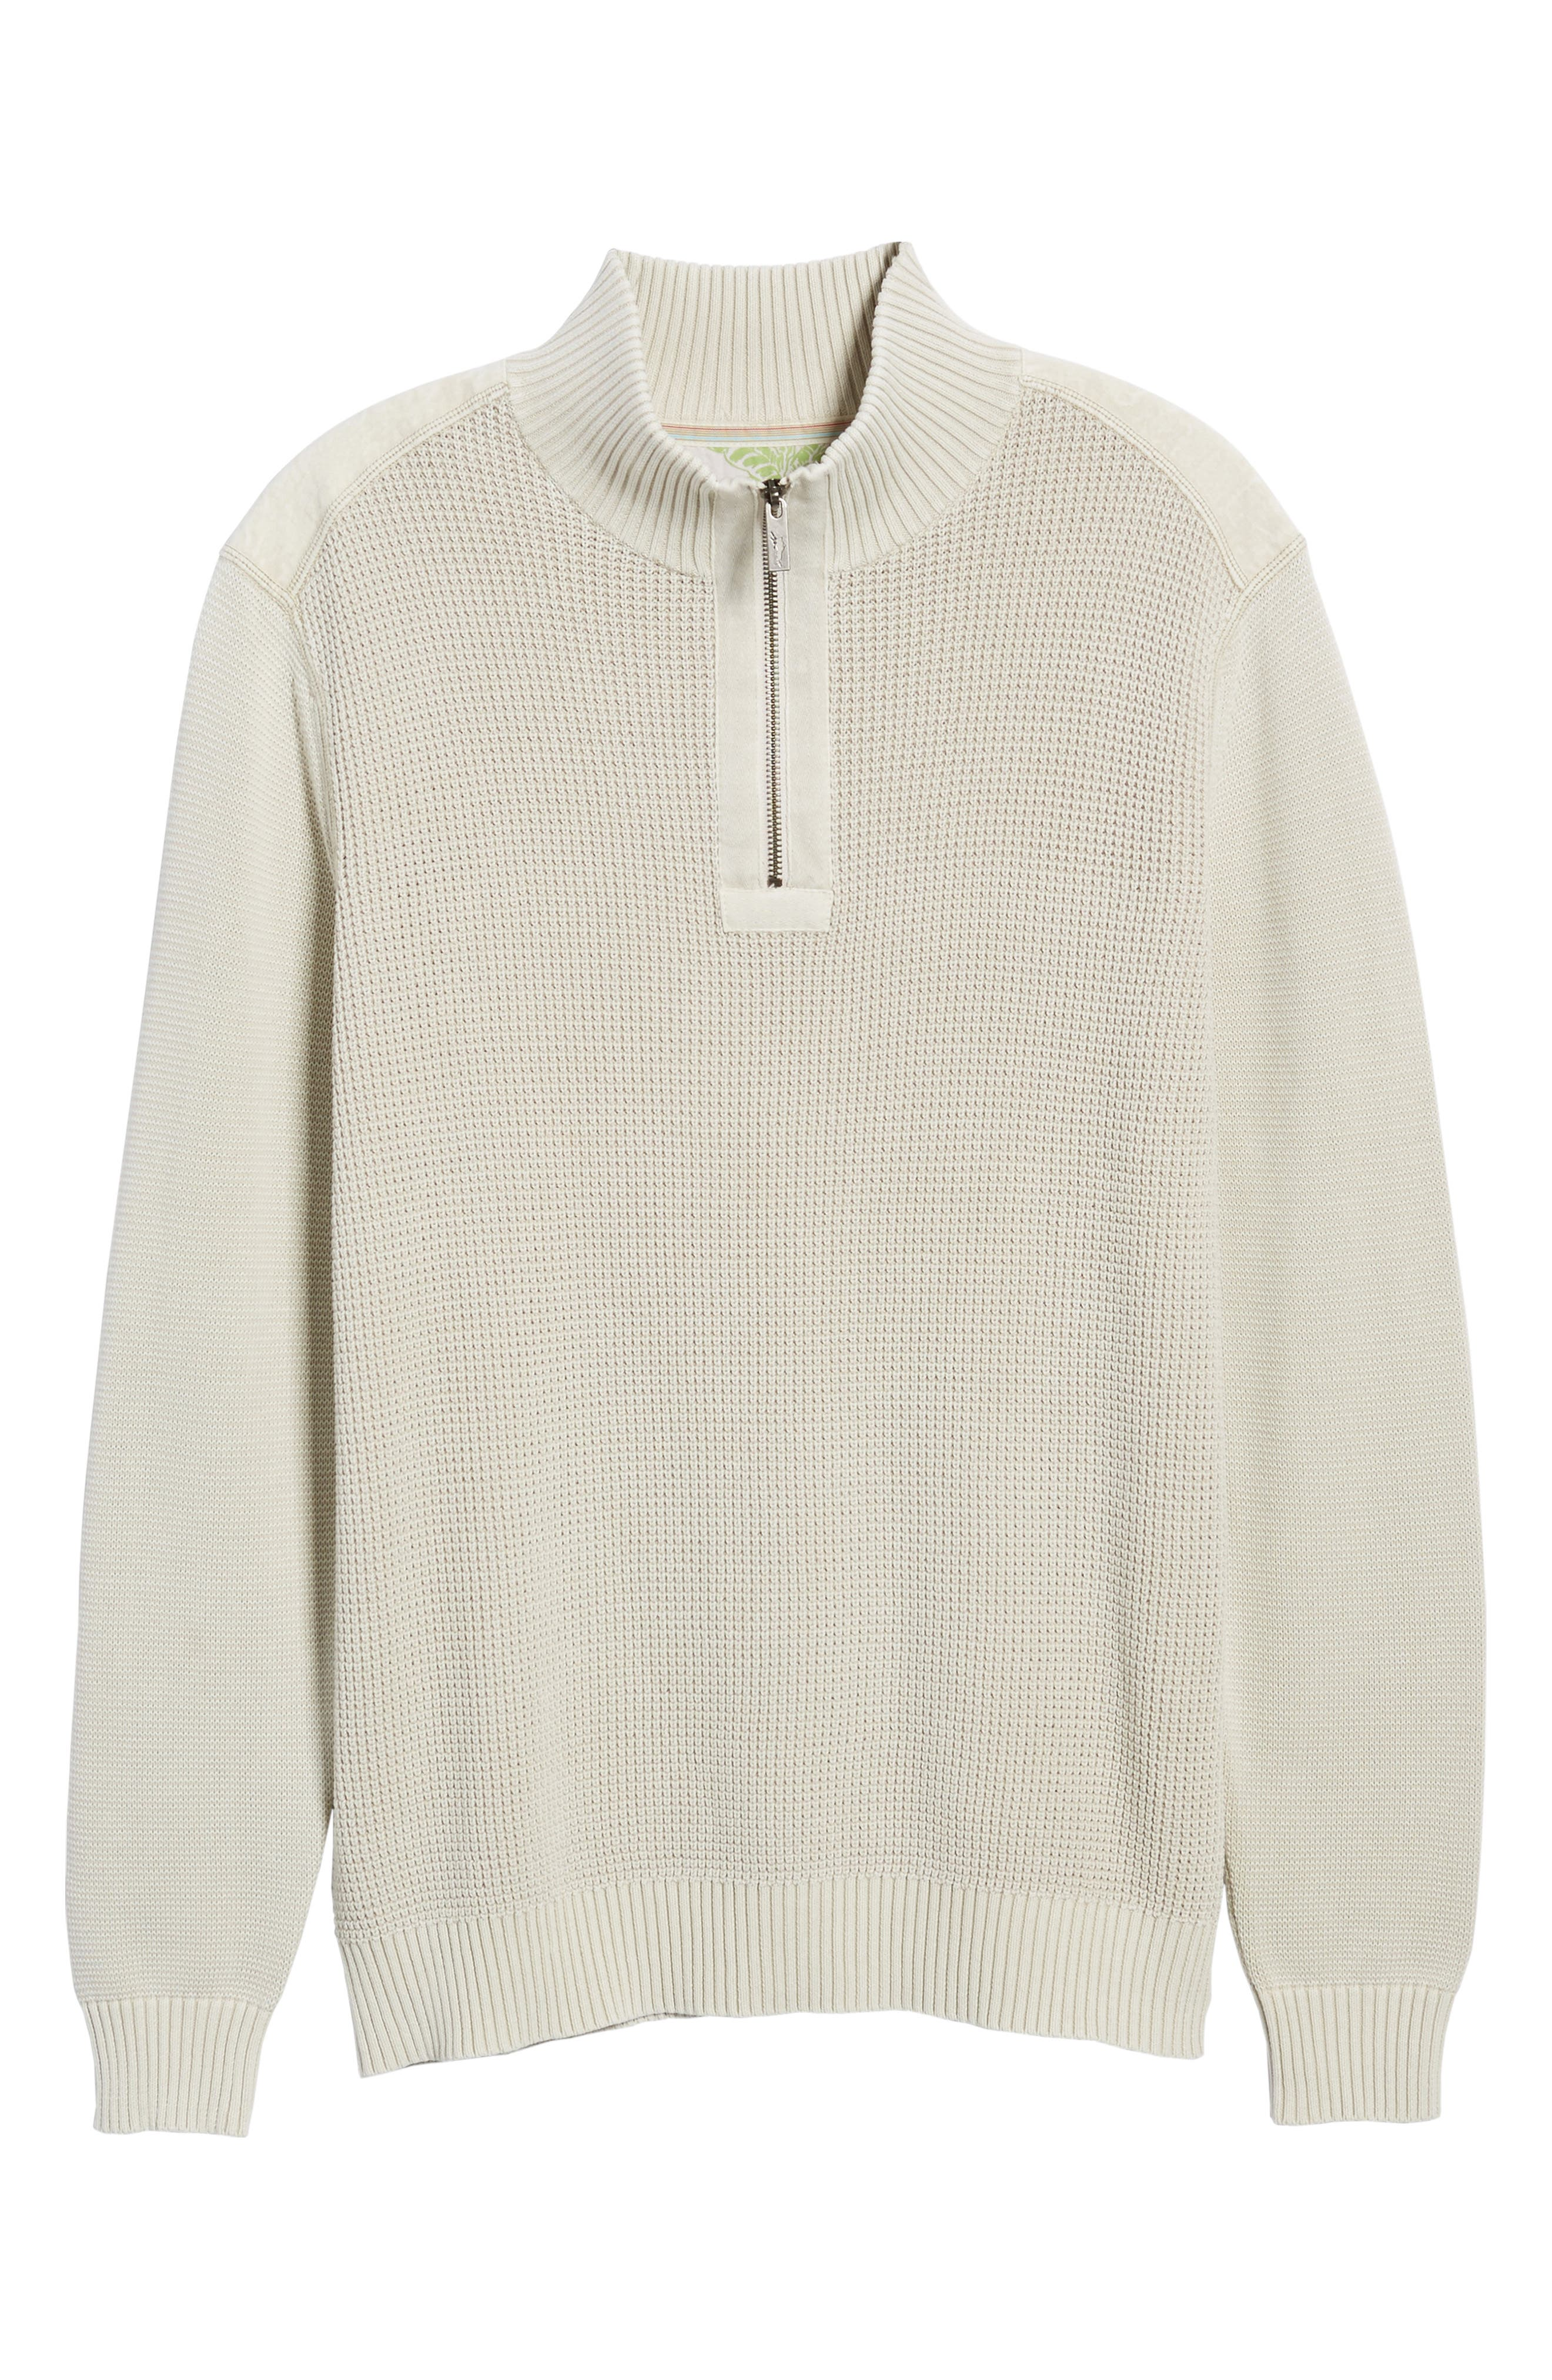 'Coastal Shores' Quarter Zip Sweater,                             Alternate thumbnail 49, color,